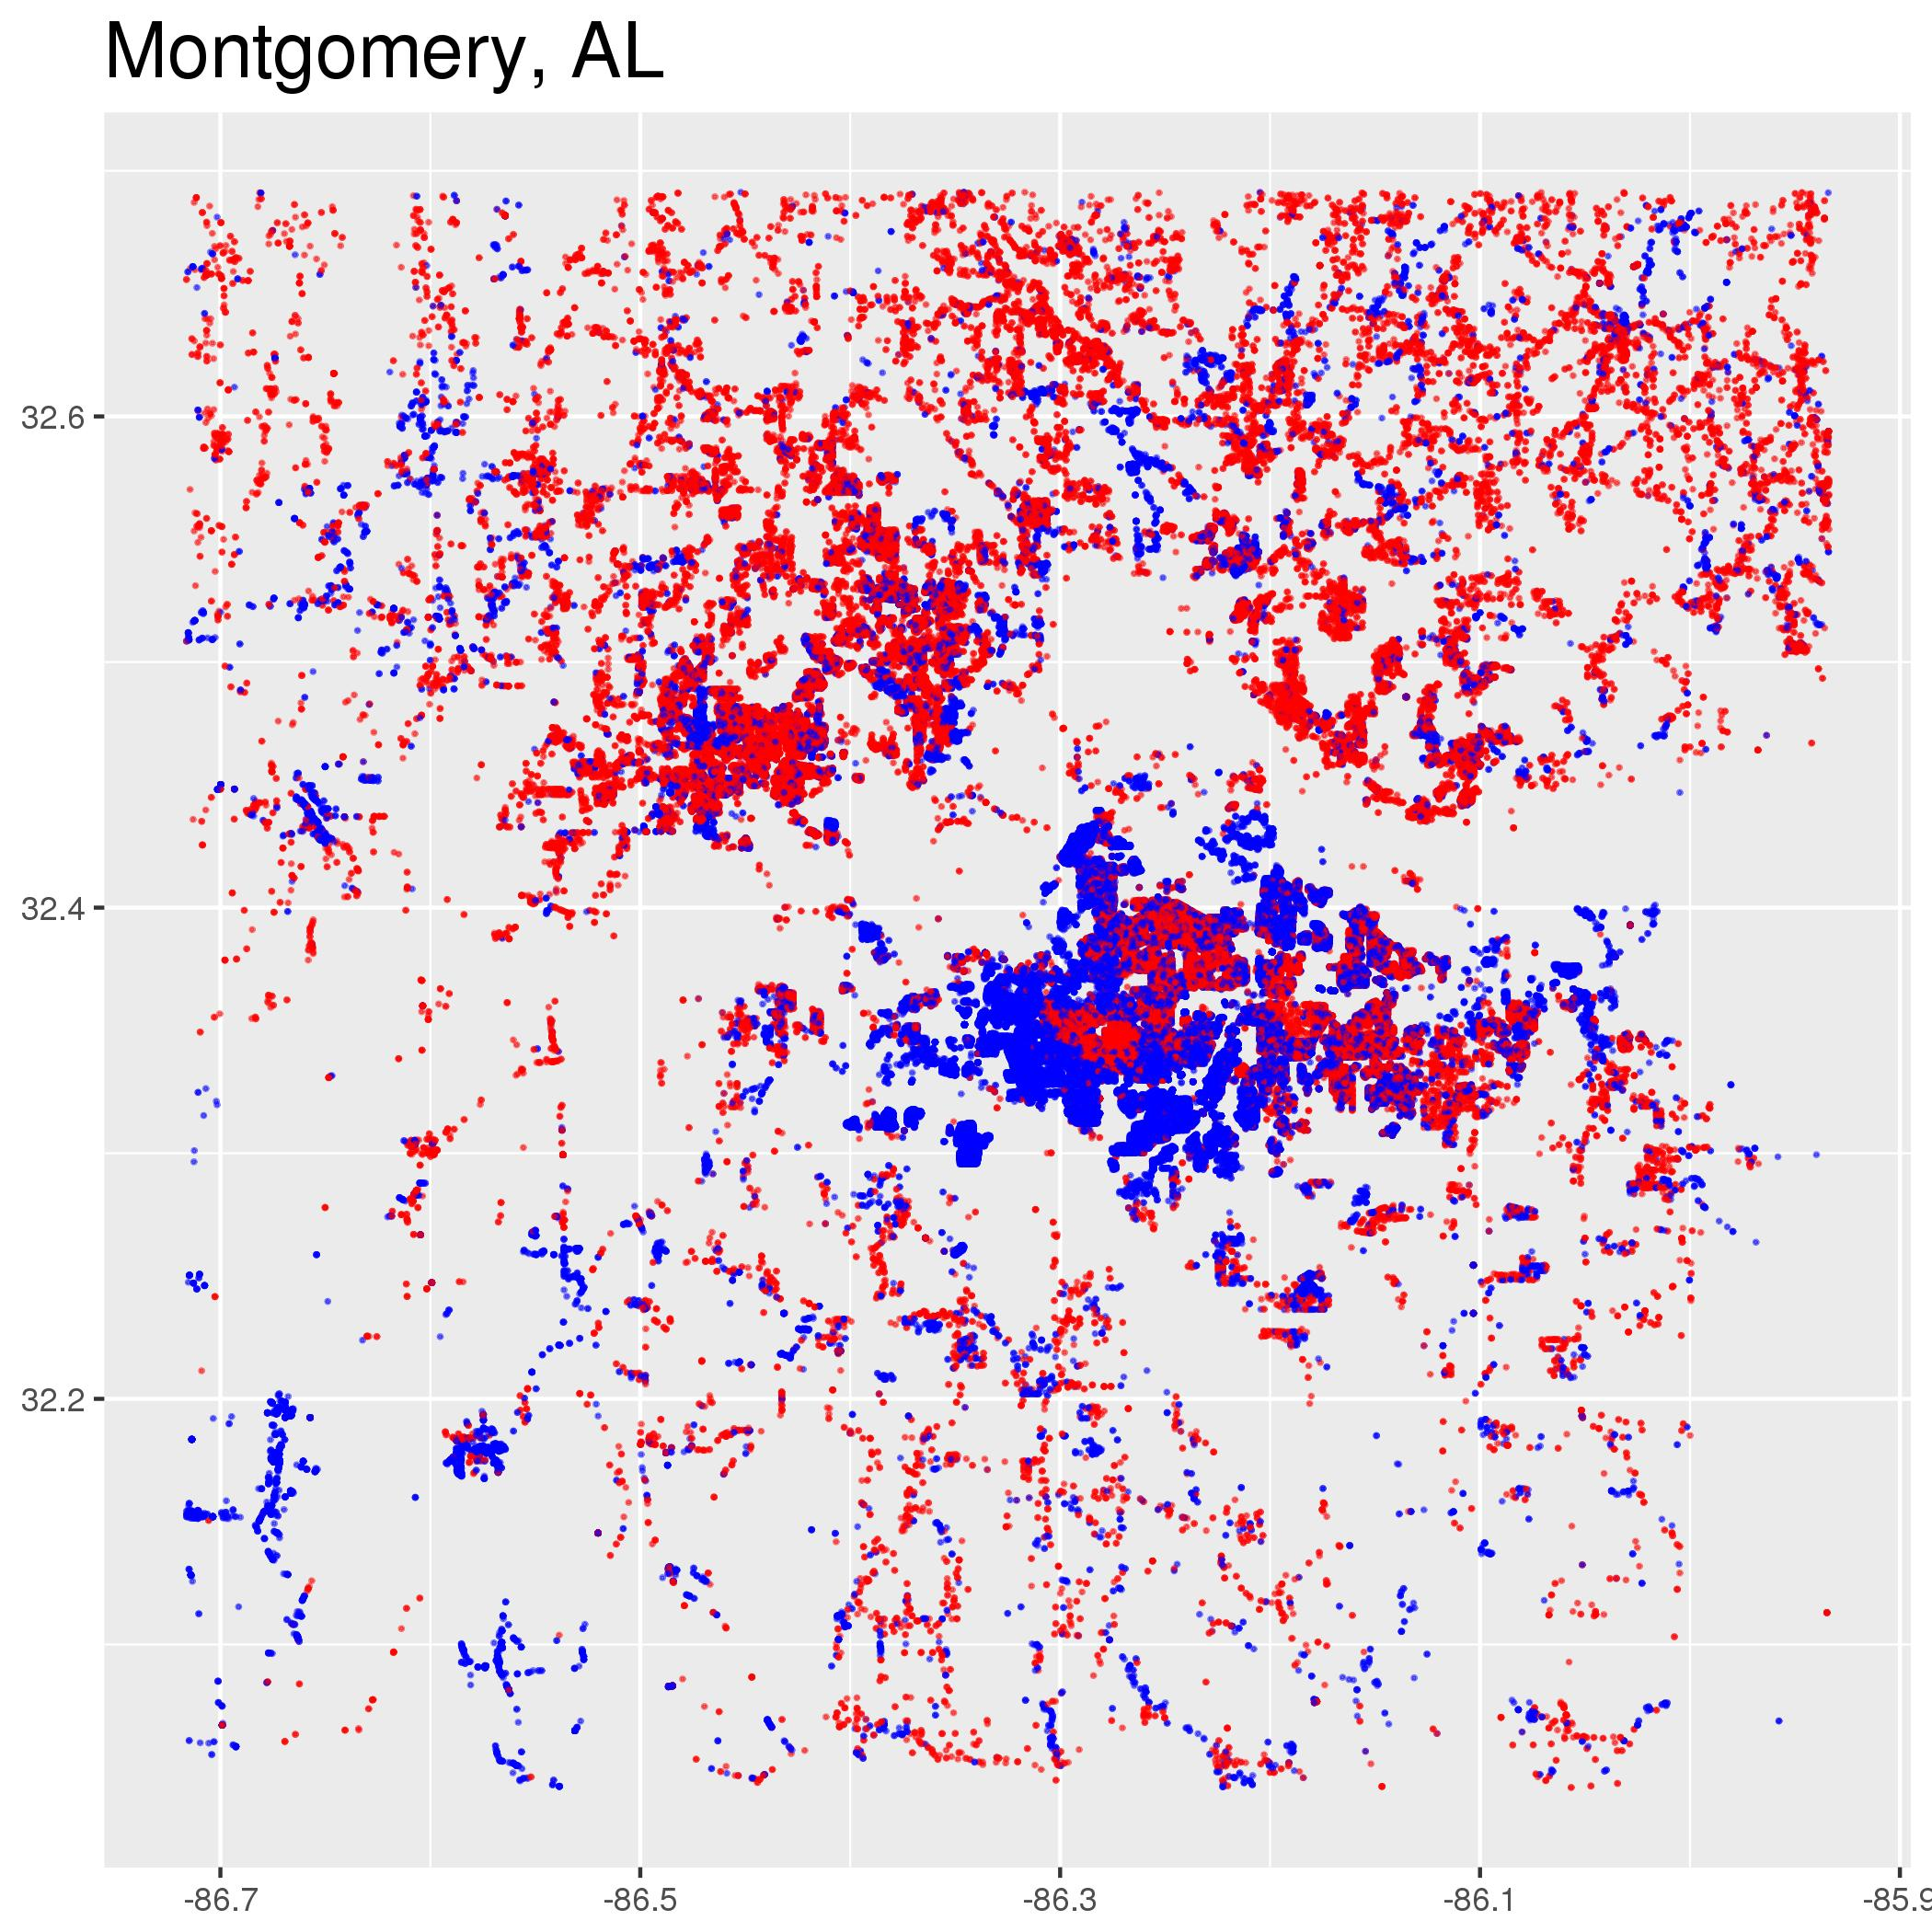 MontgomeryAL.jpeg